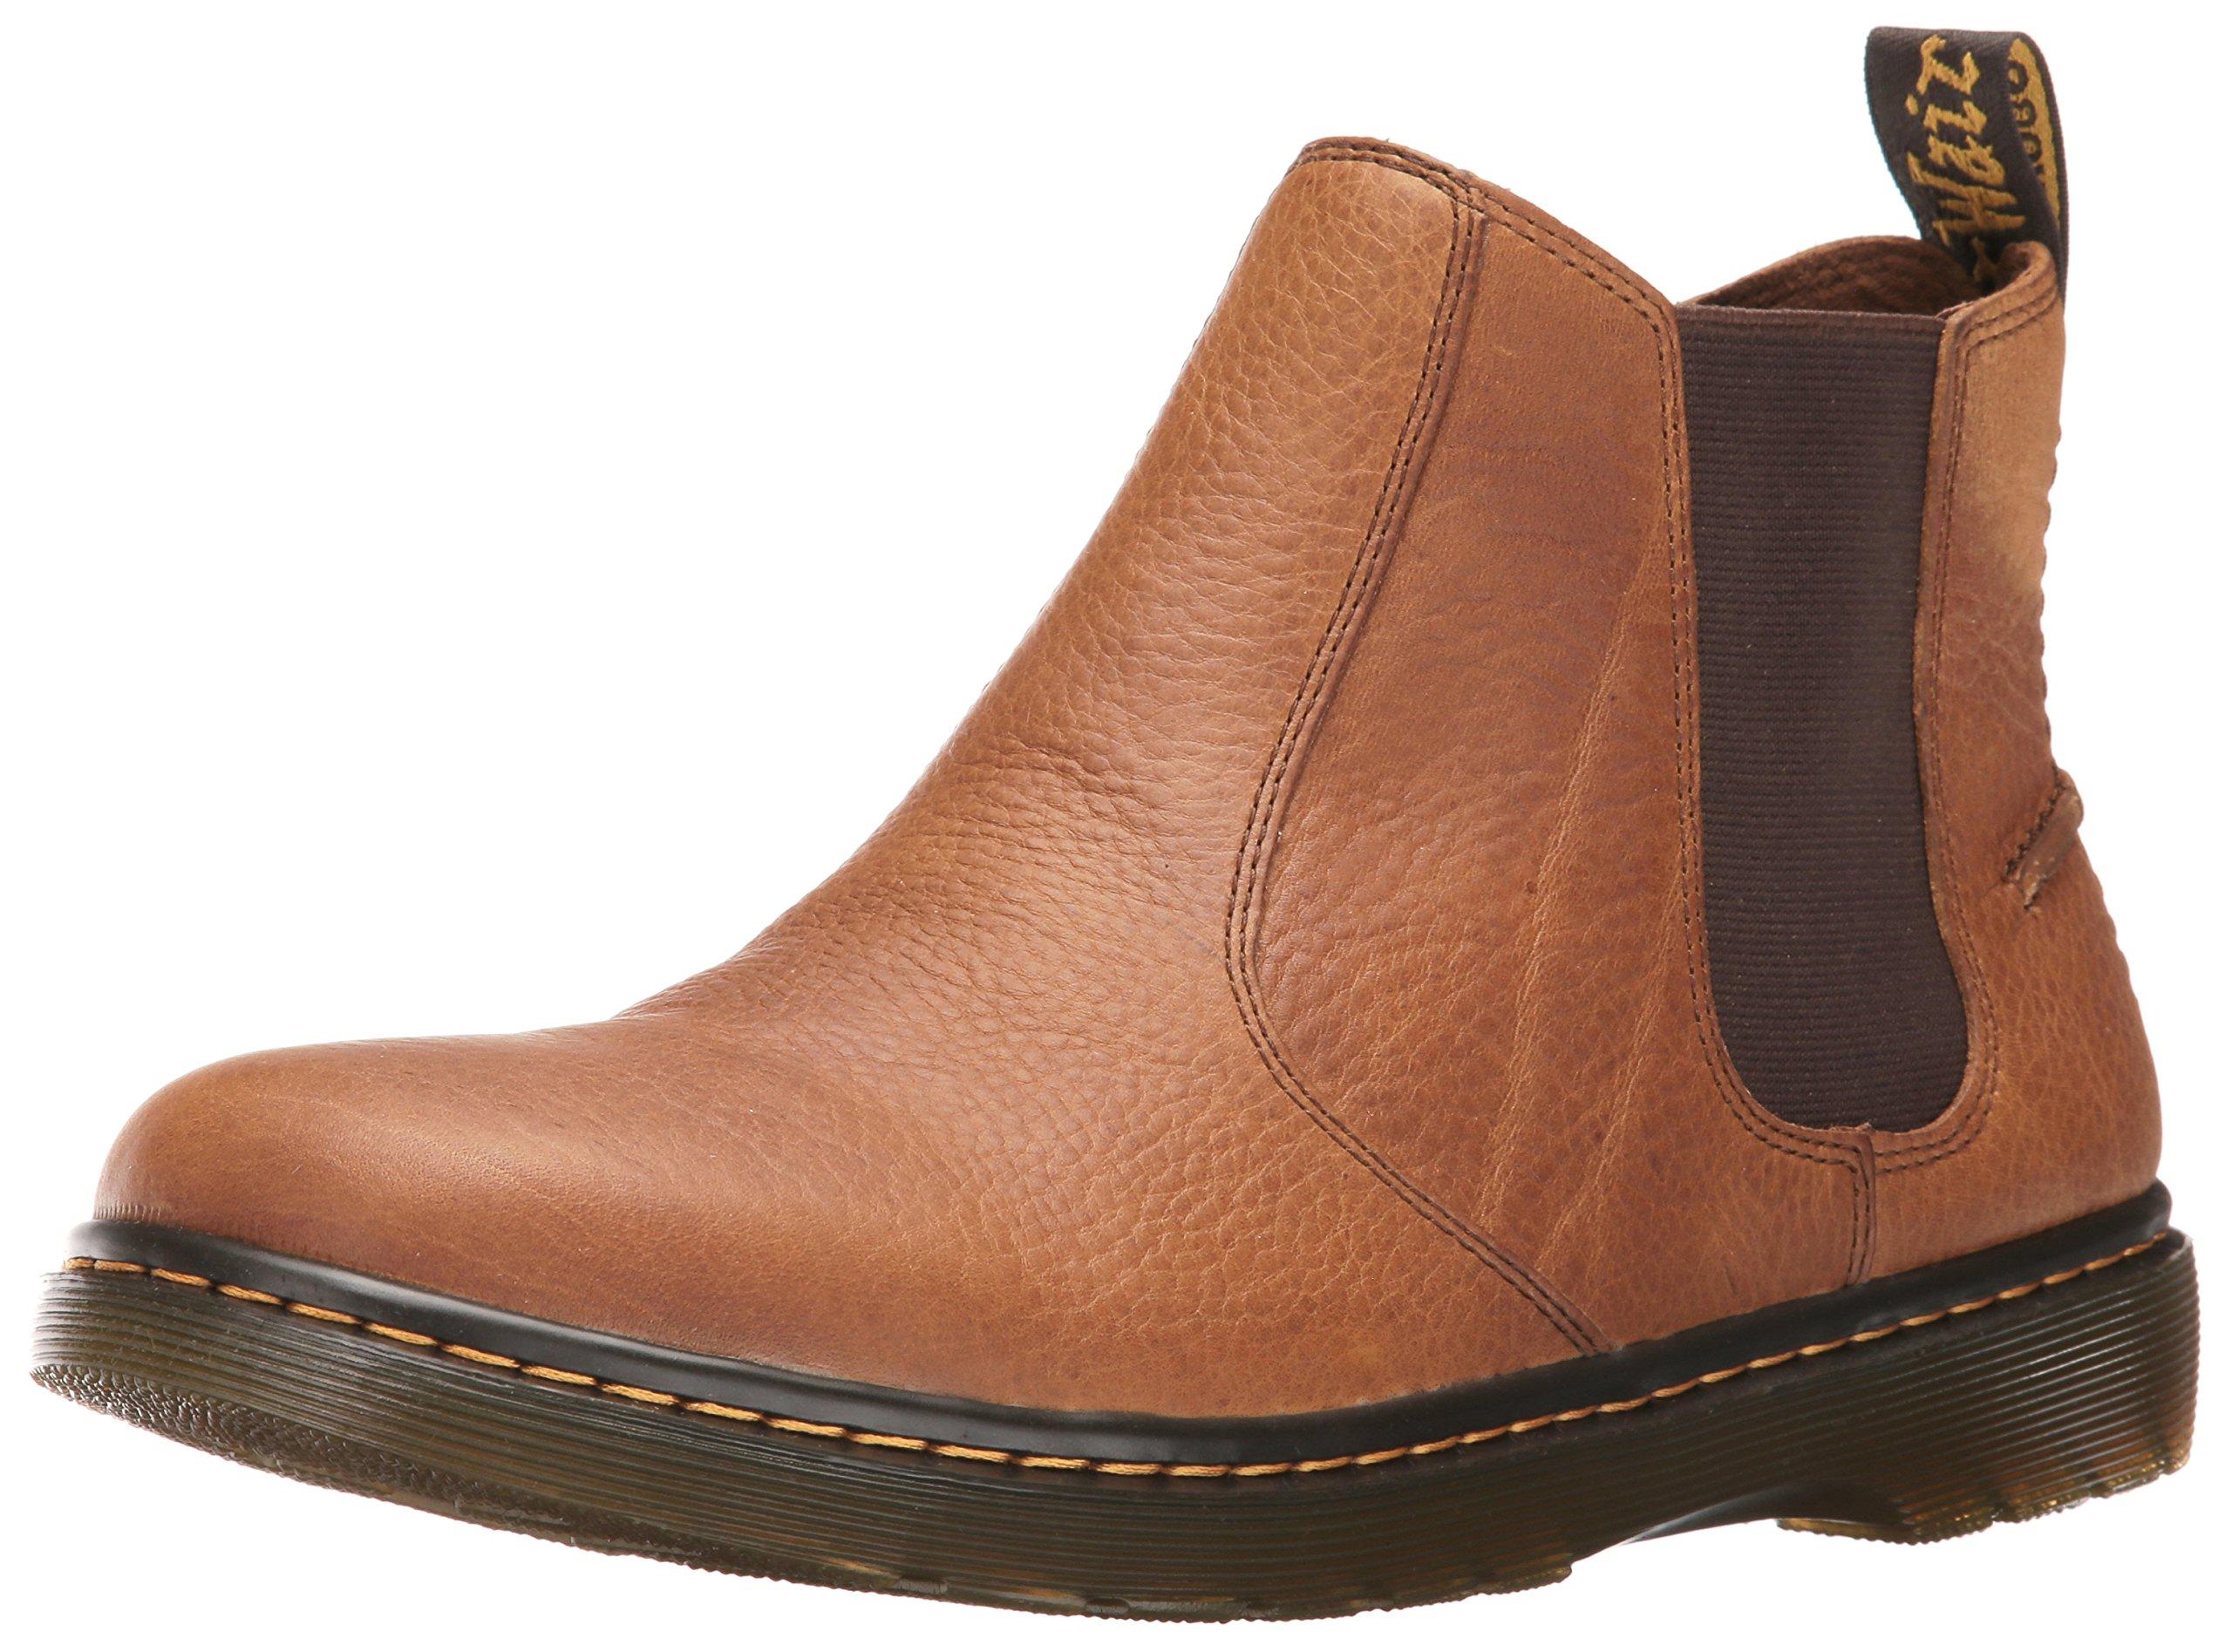 Dr. Martens Men's Lyme Chelsea Boot, Tan, 9 UK/10 M US by Dr. Martens